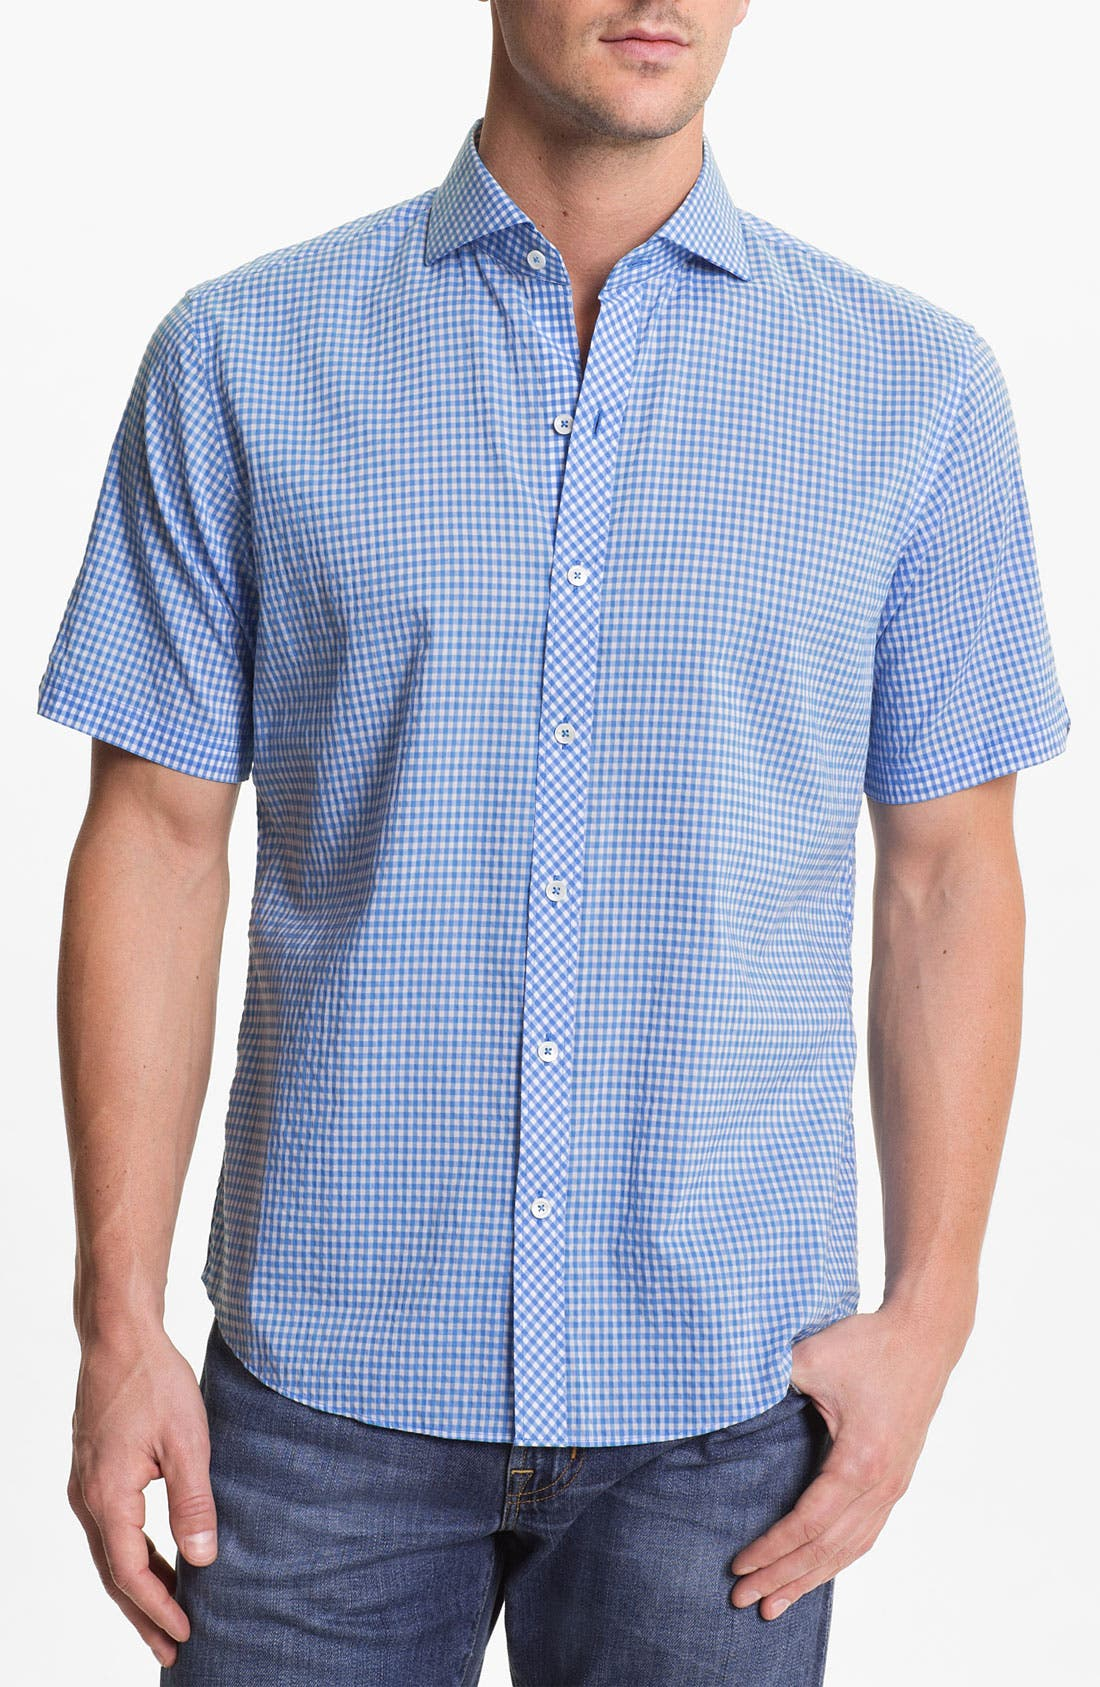 Alternate Image 1 Selected - Zachary Prell 'Davenport' Sport Shirt